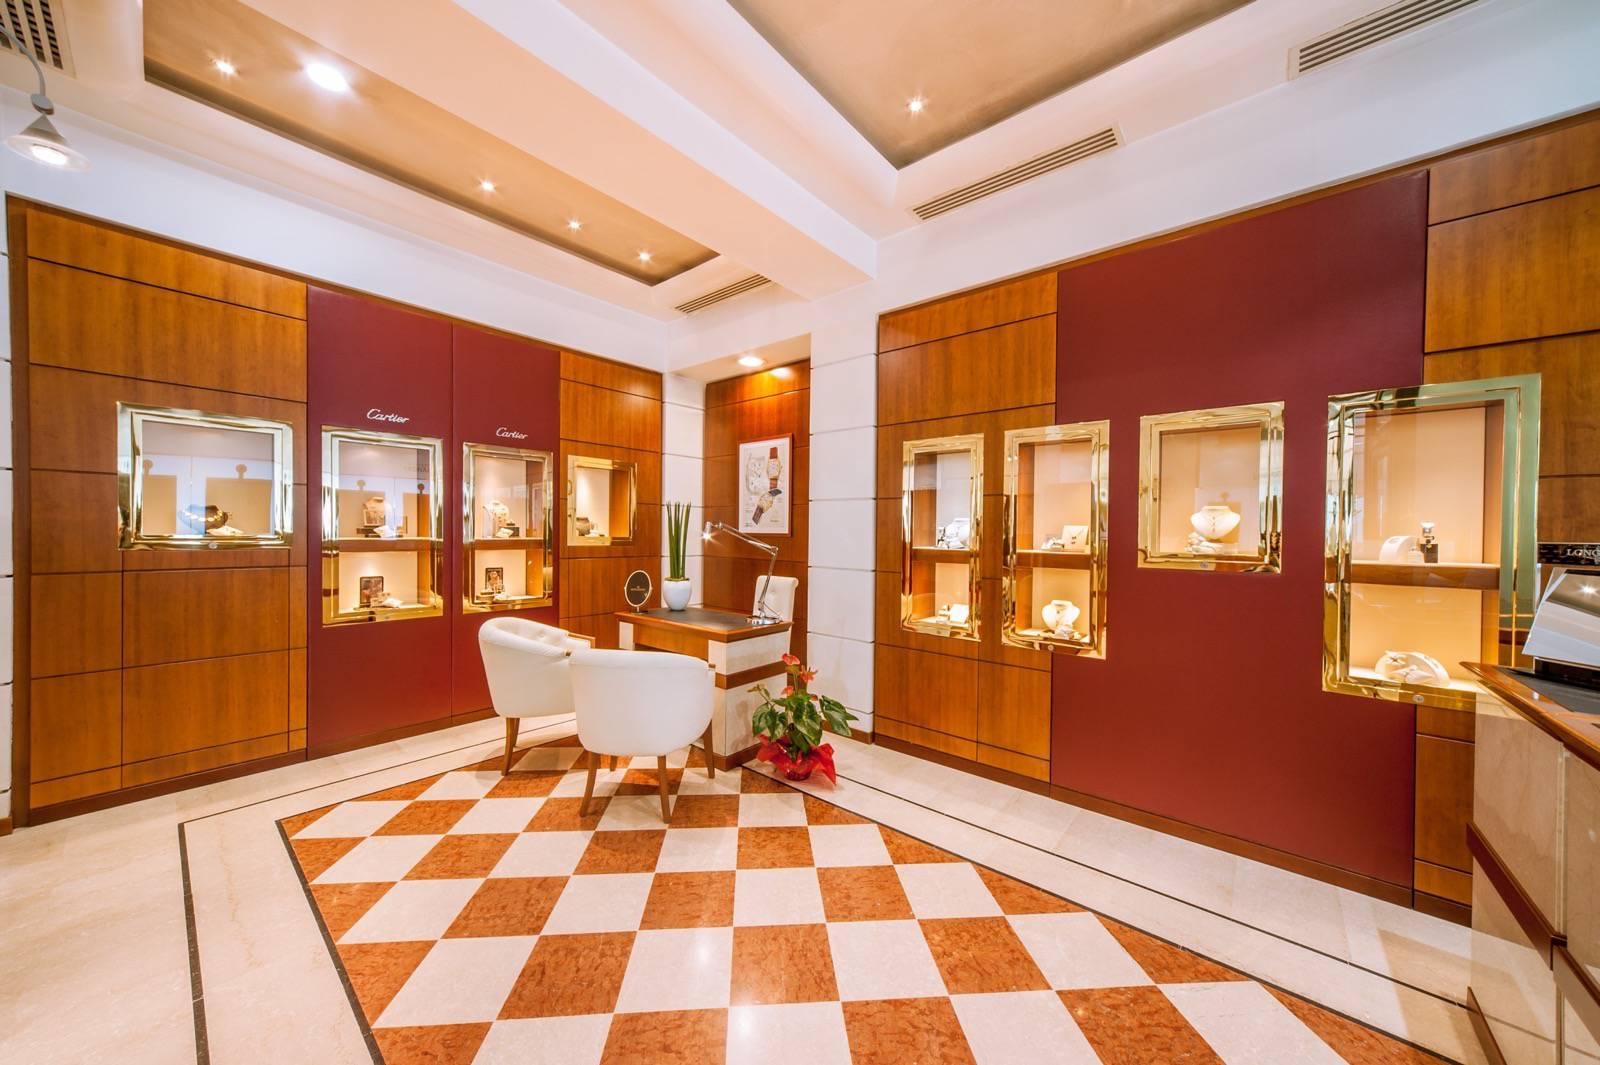 gioielli-leonardo-gioielleria-mestre-venezia-8